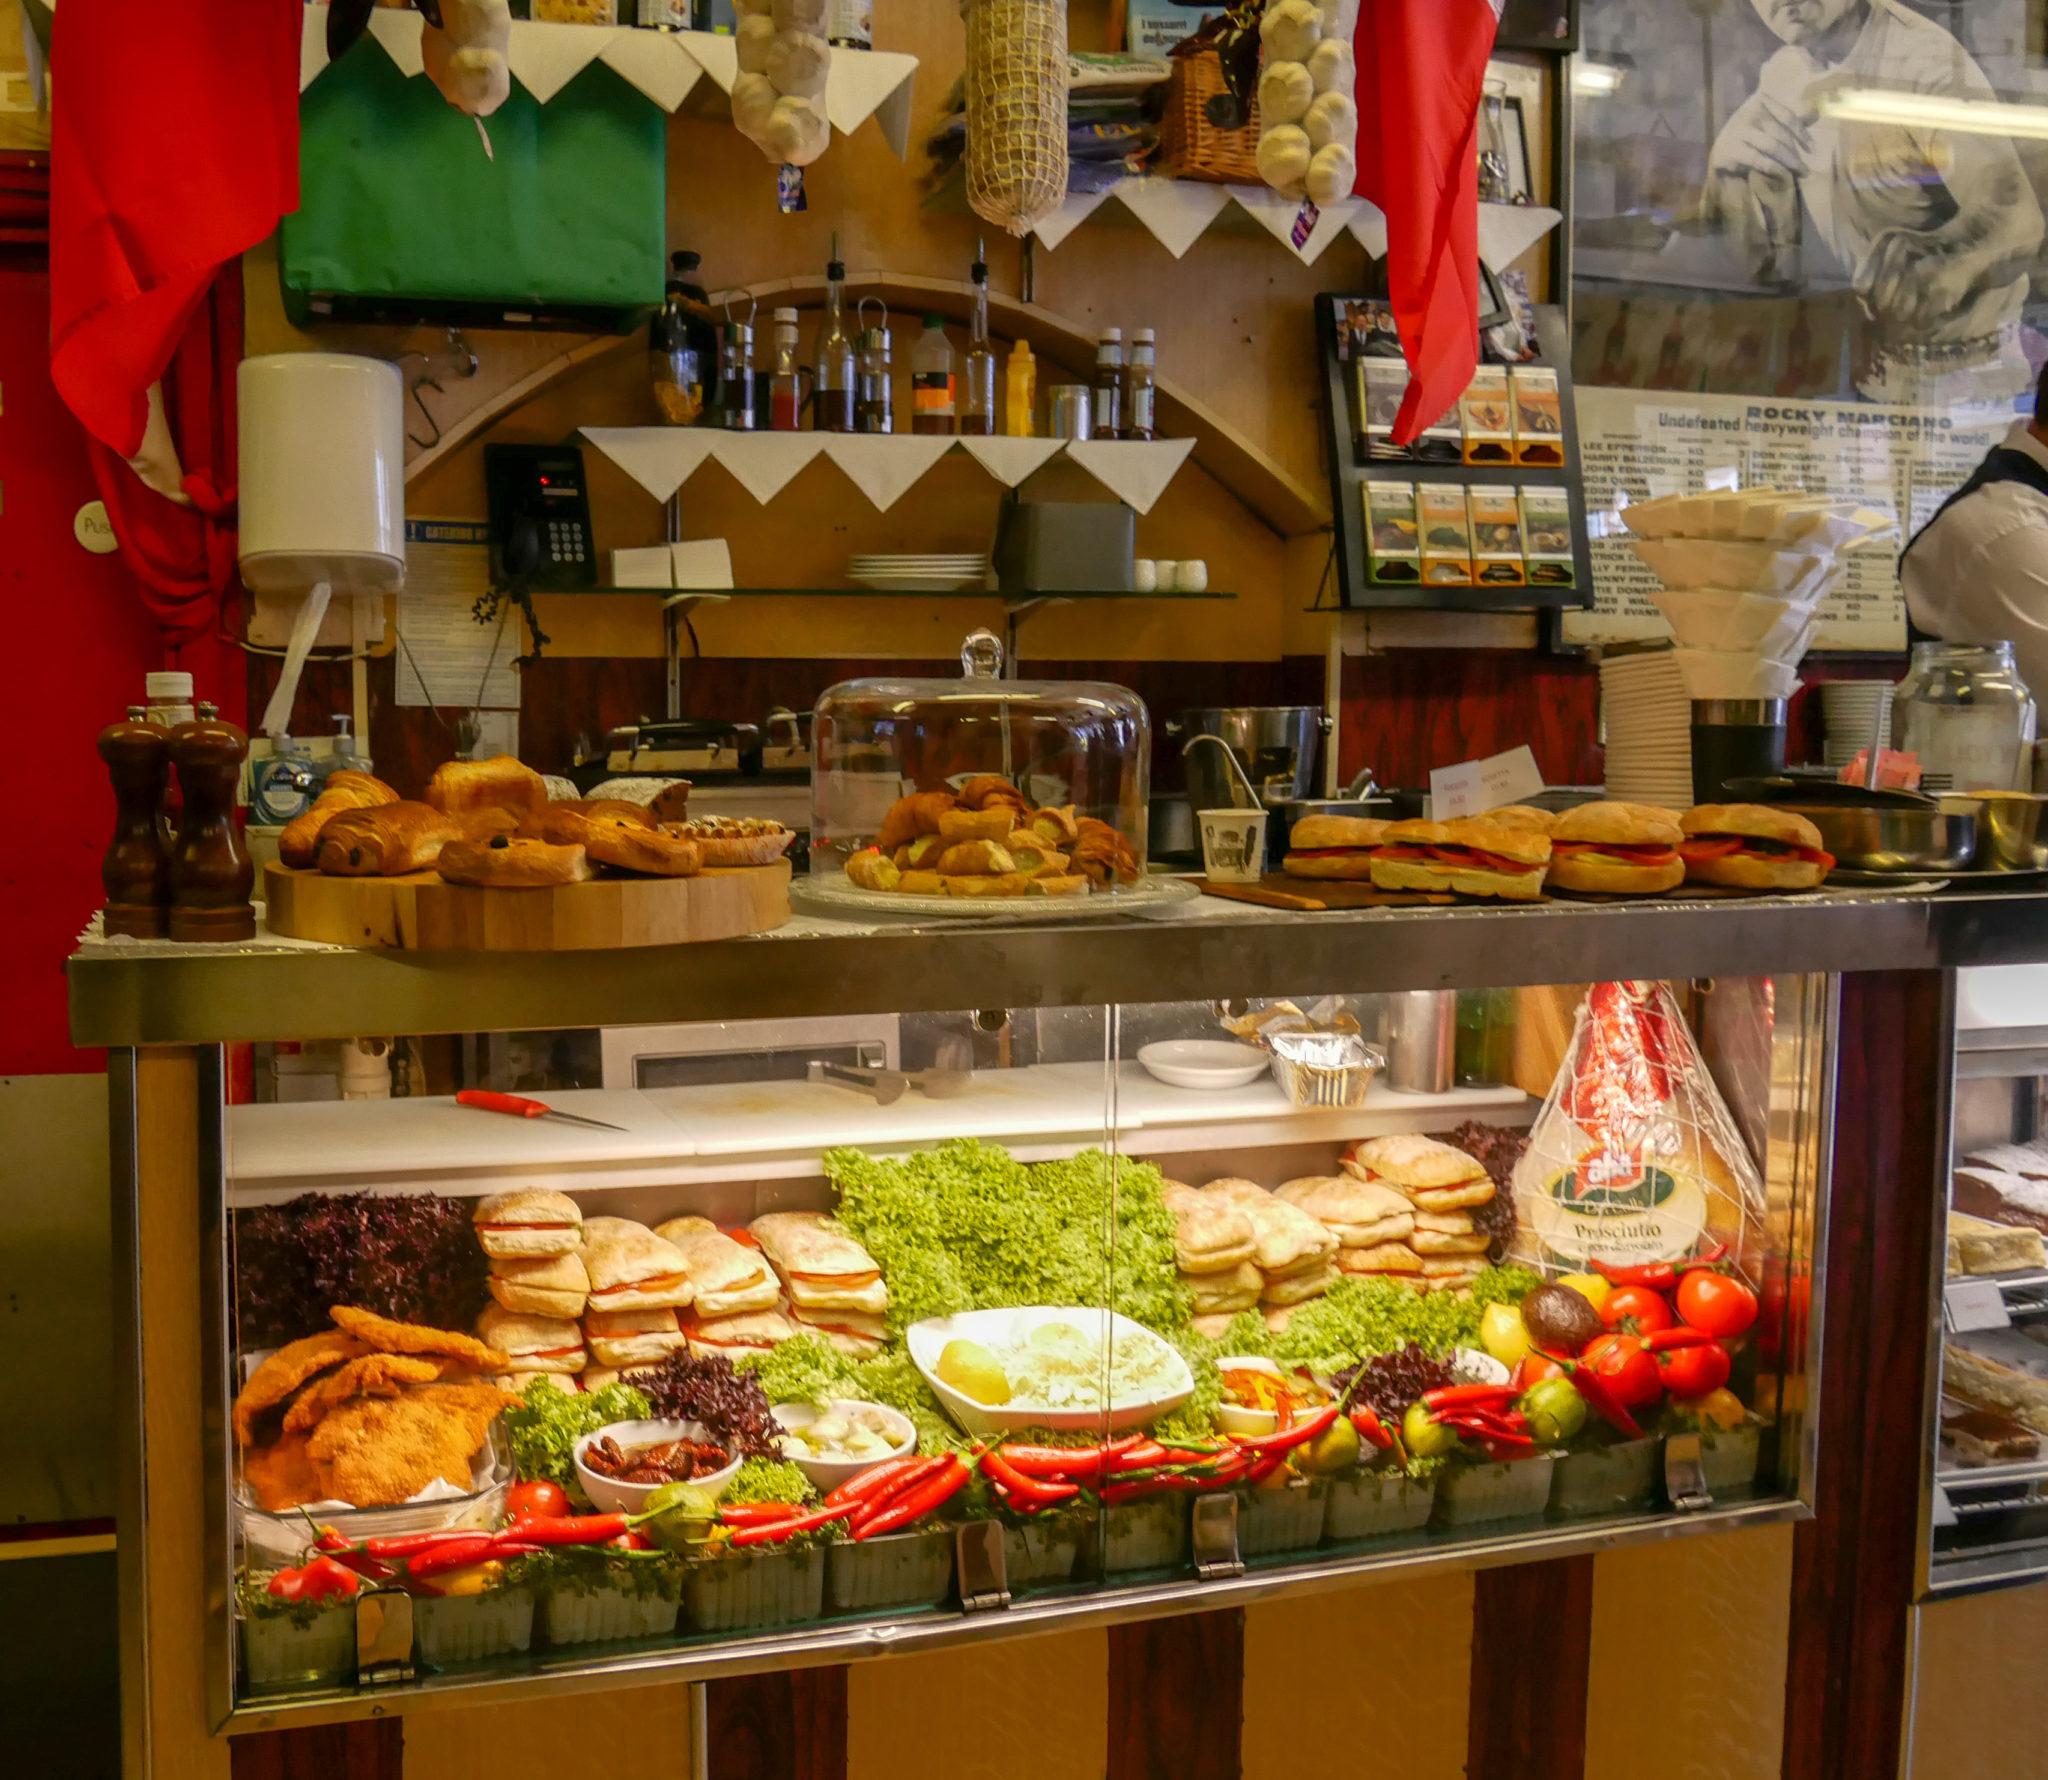 the sandwich counter at Bar Italia, Soho, London